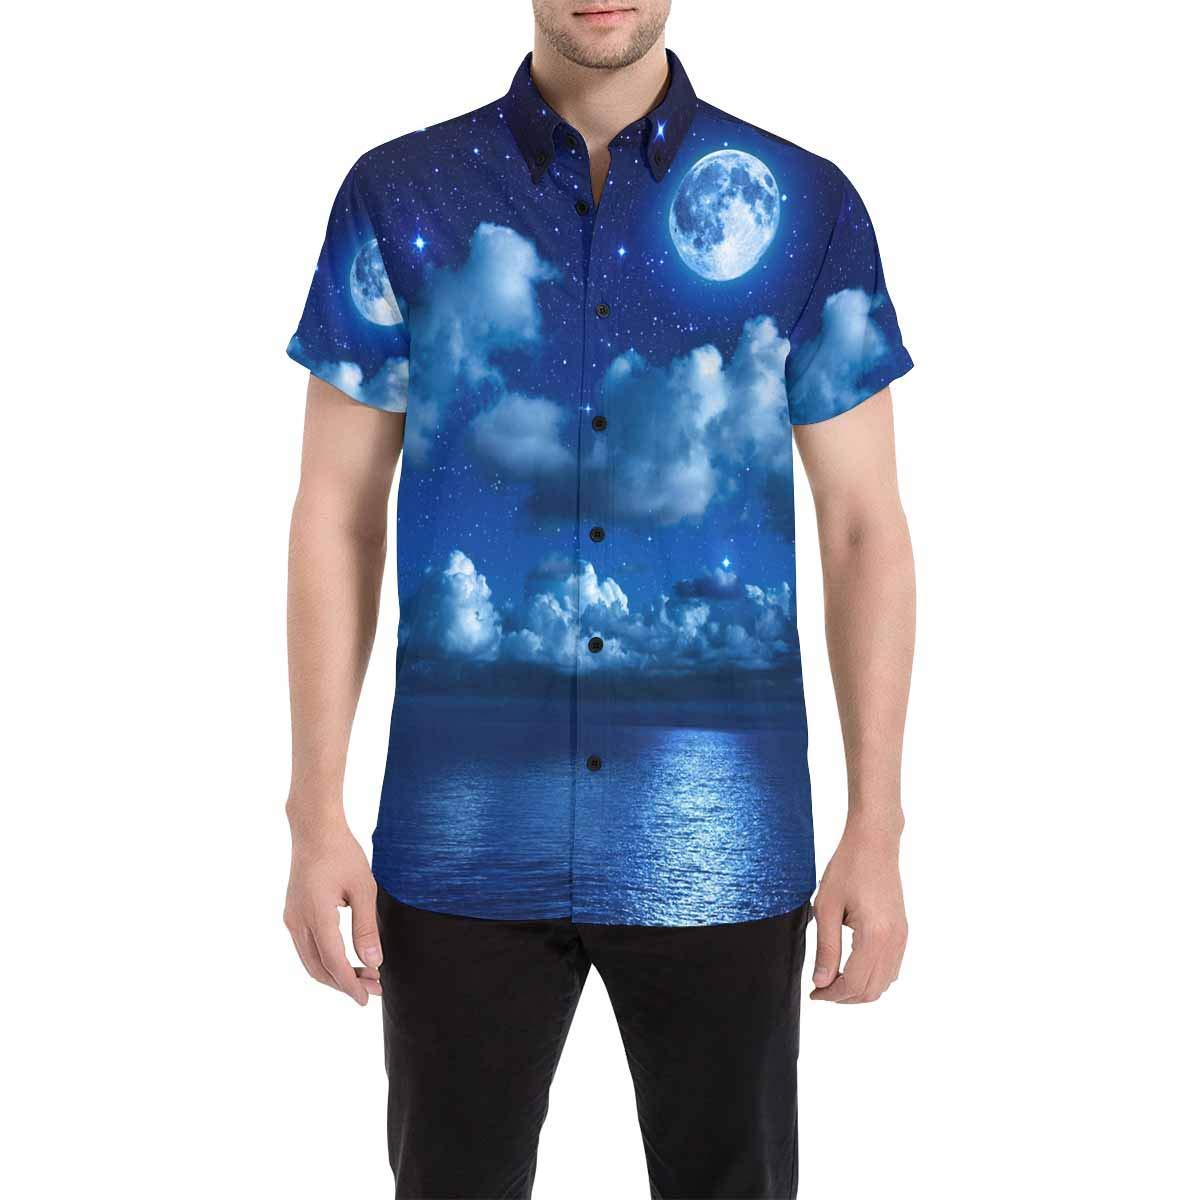 InterestPrint Men Botton Up T-Shirt Beach Letters Starfish Beach Sand Sea Regular Fit Short Sleeve Polo Casual T-Shirts S-5XL